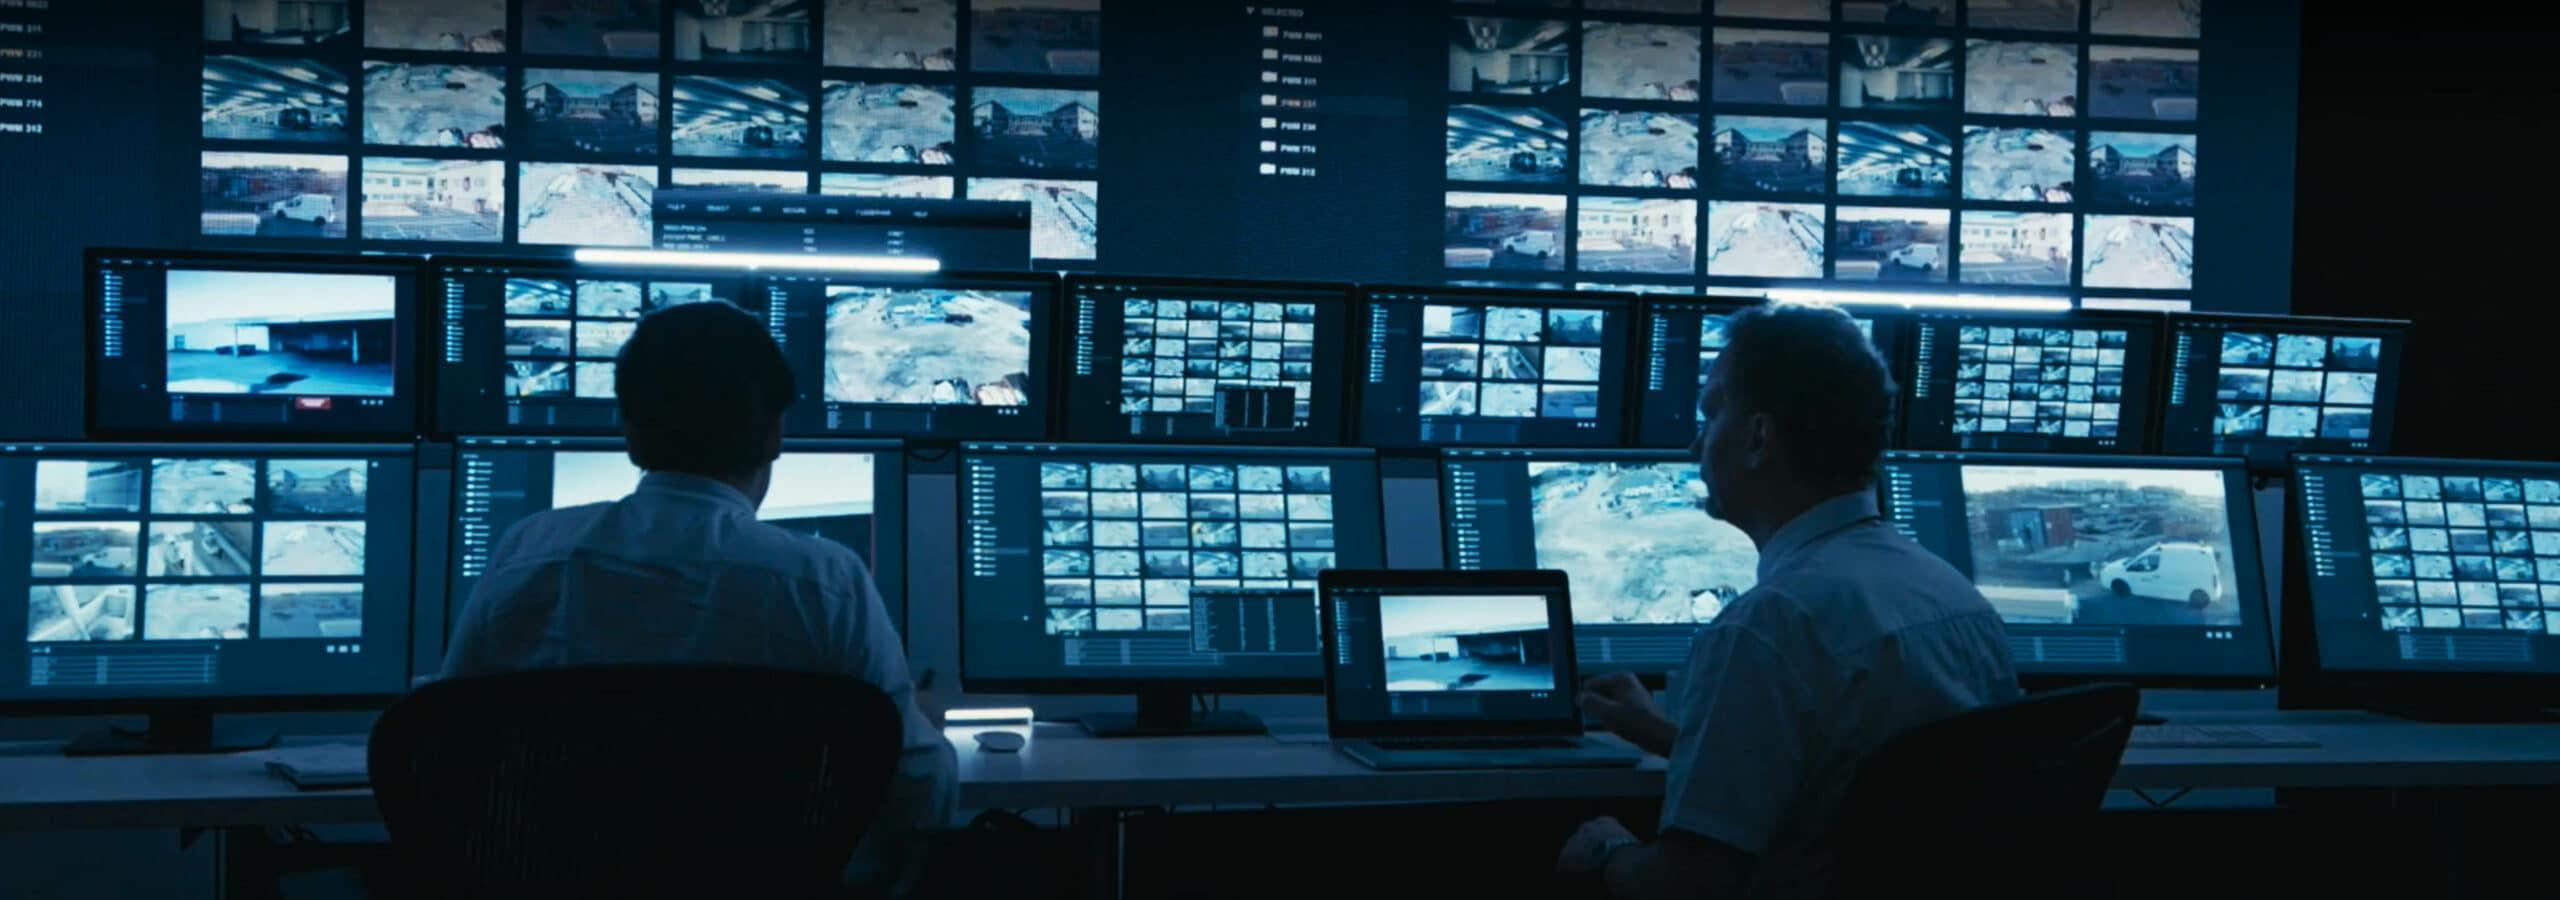 System operating center